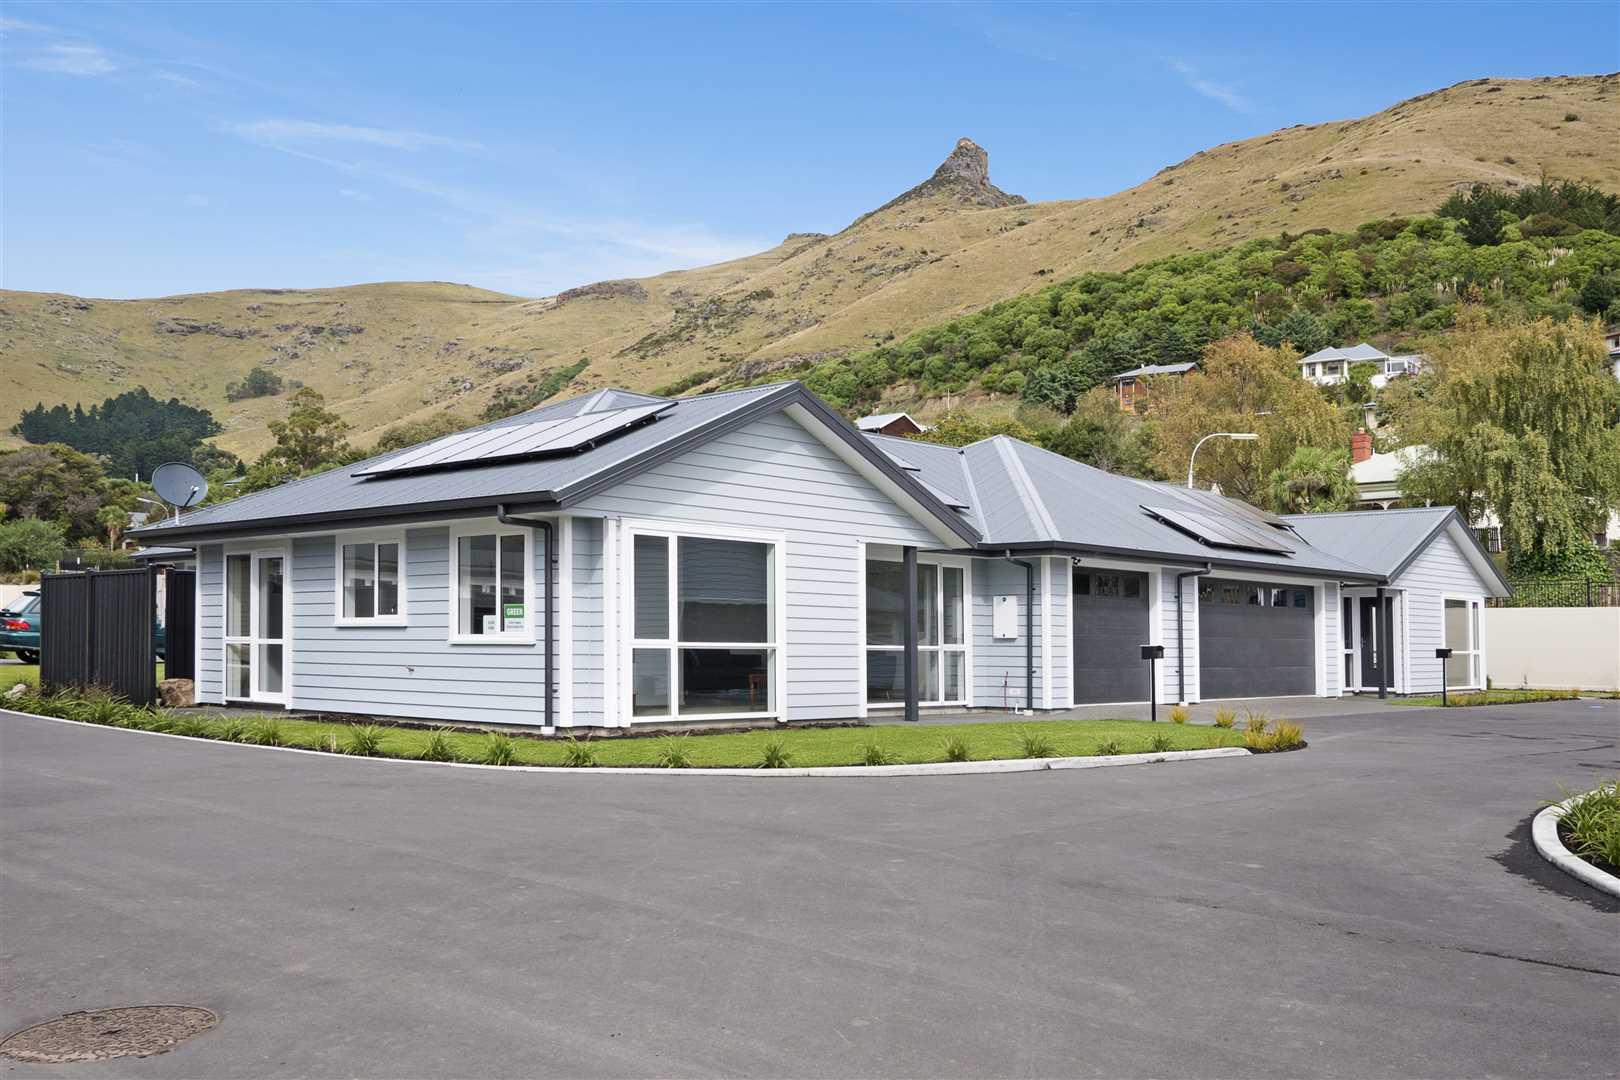 Maltworks - Over 50's Lifestyle Villas